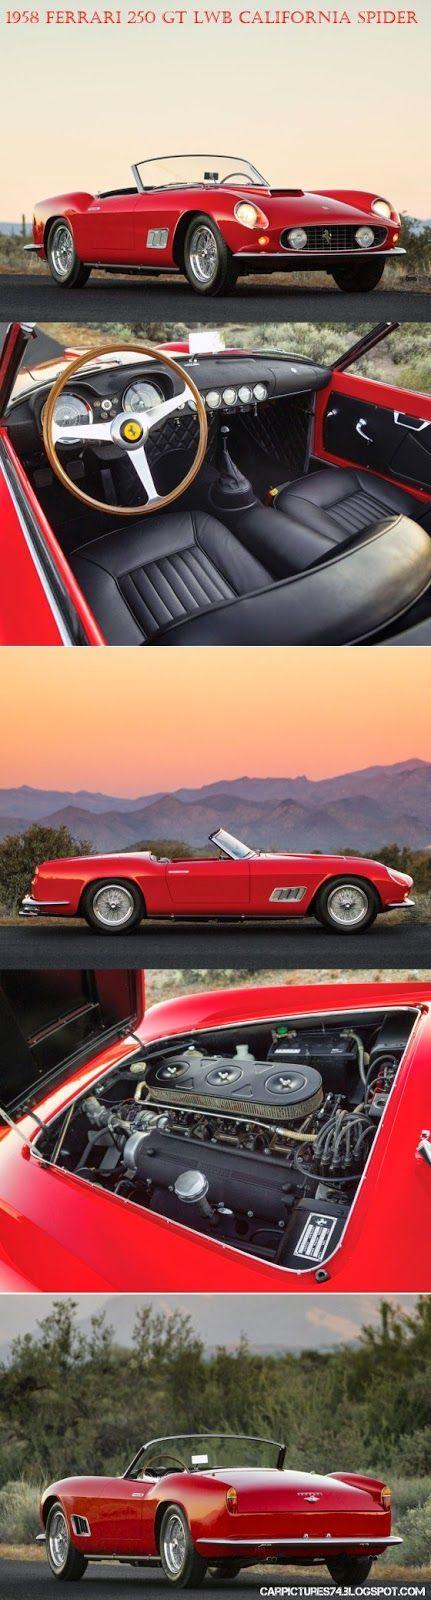 1958 Ferrari 250 GT LWB California Spider by Scaglietti.